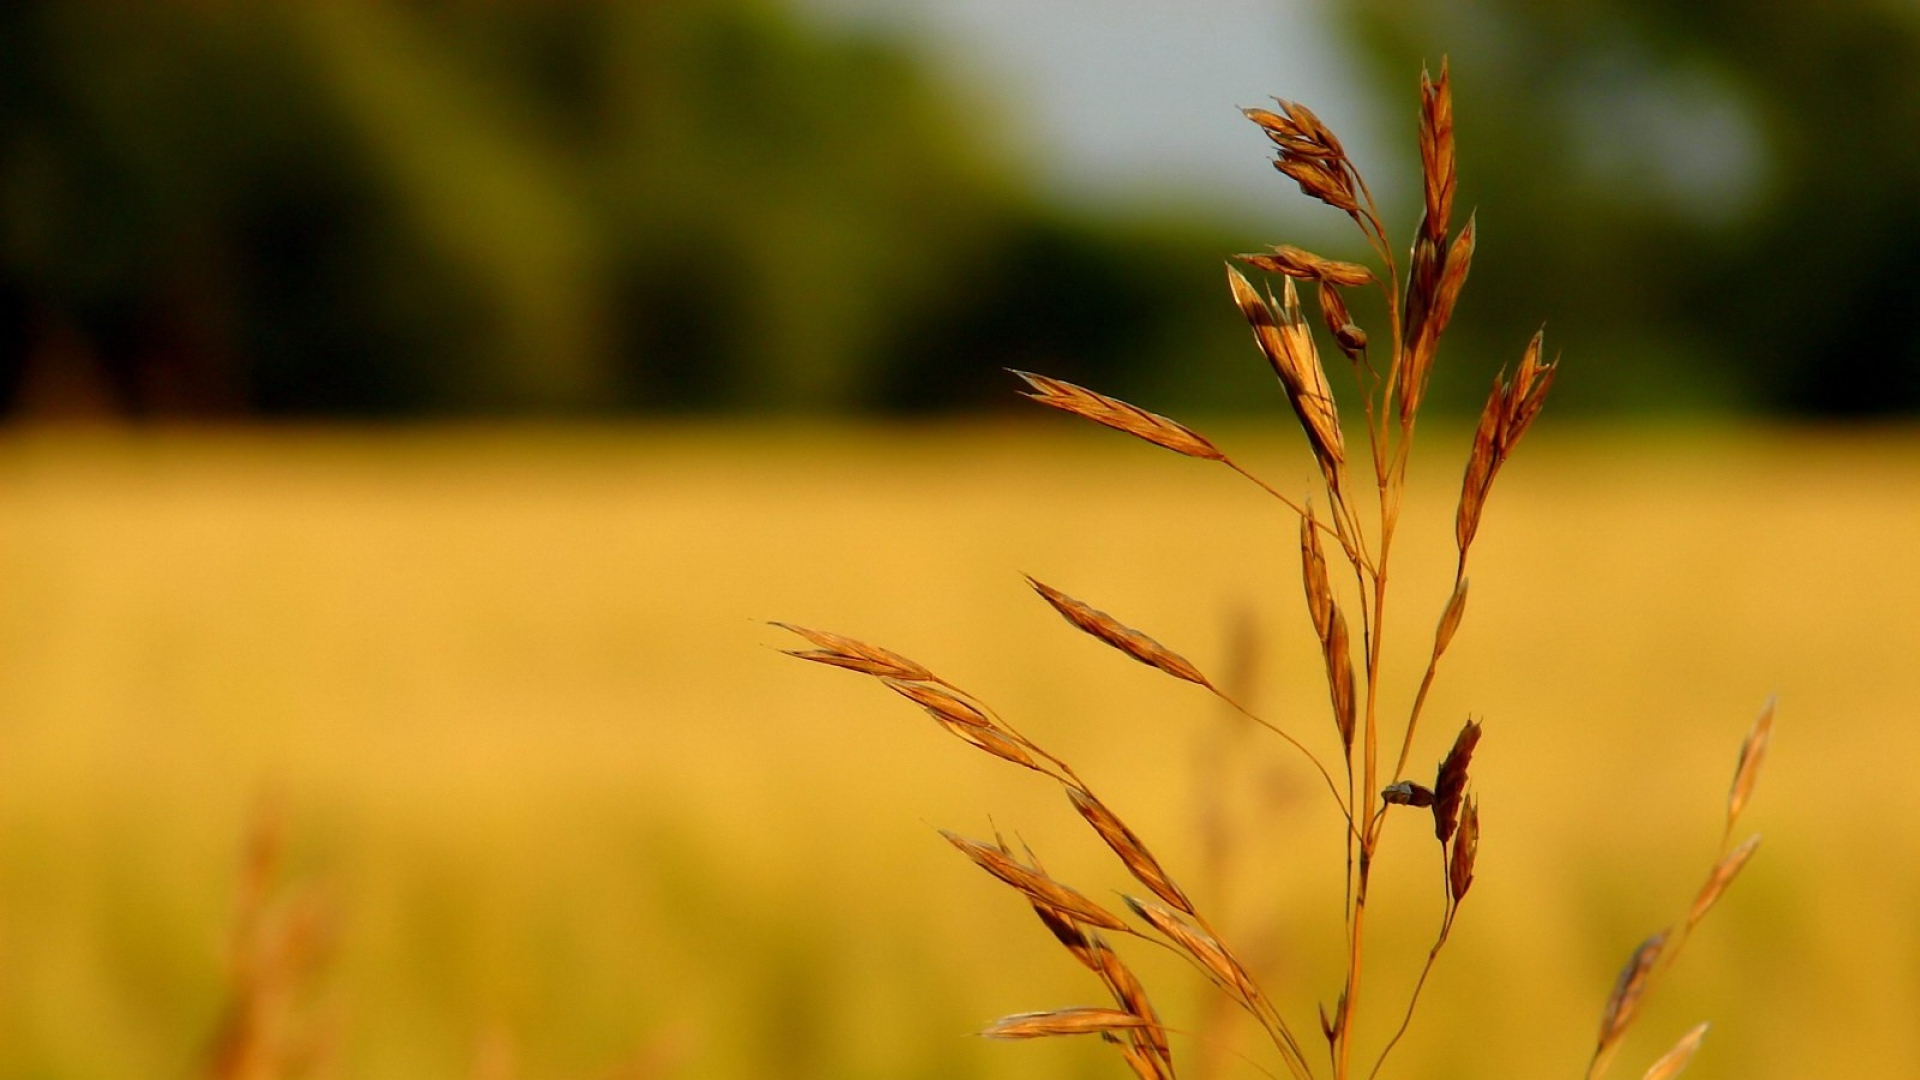 dry grass field background. Grass, Dry, Field Dry Grass Background A